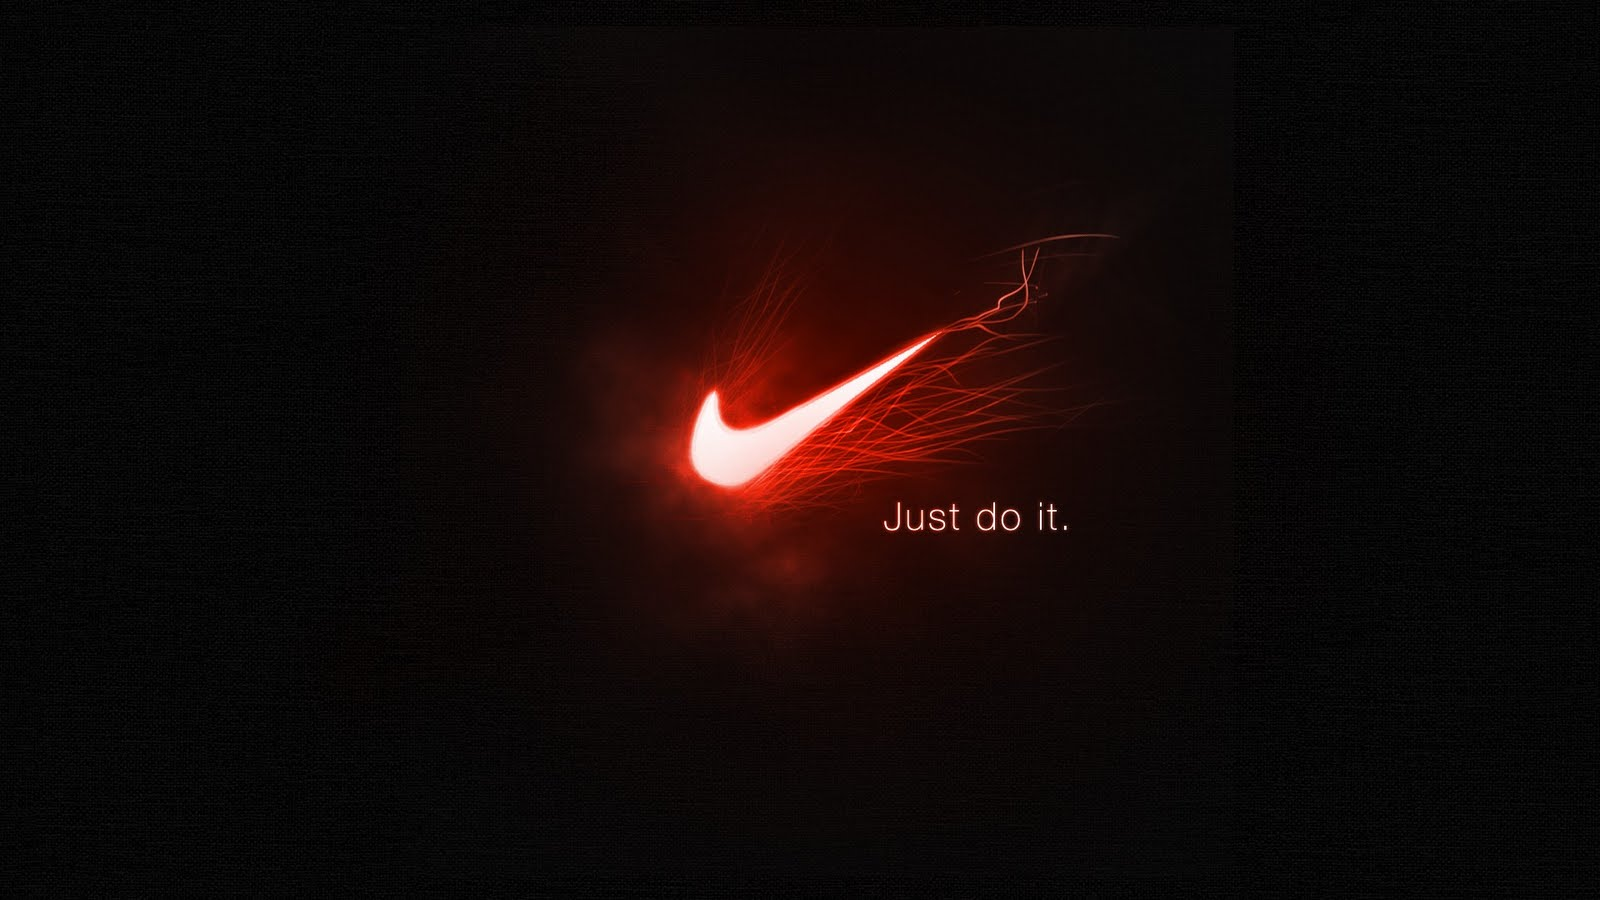 Nike Wallpapers Full HD 1600x900